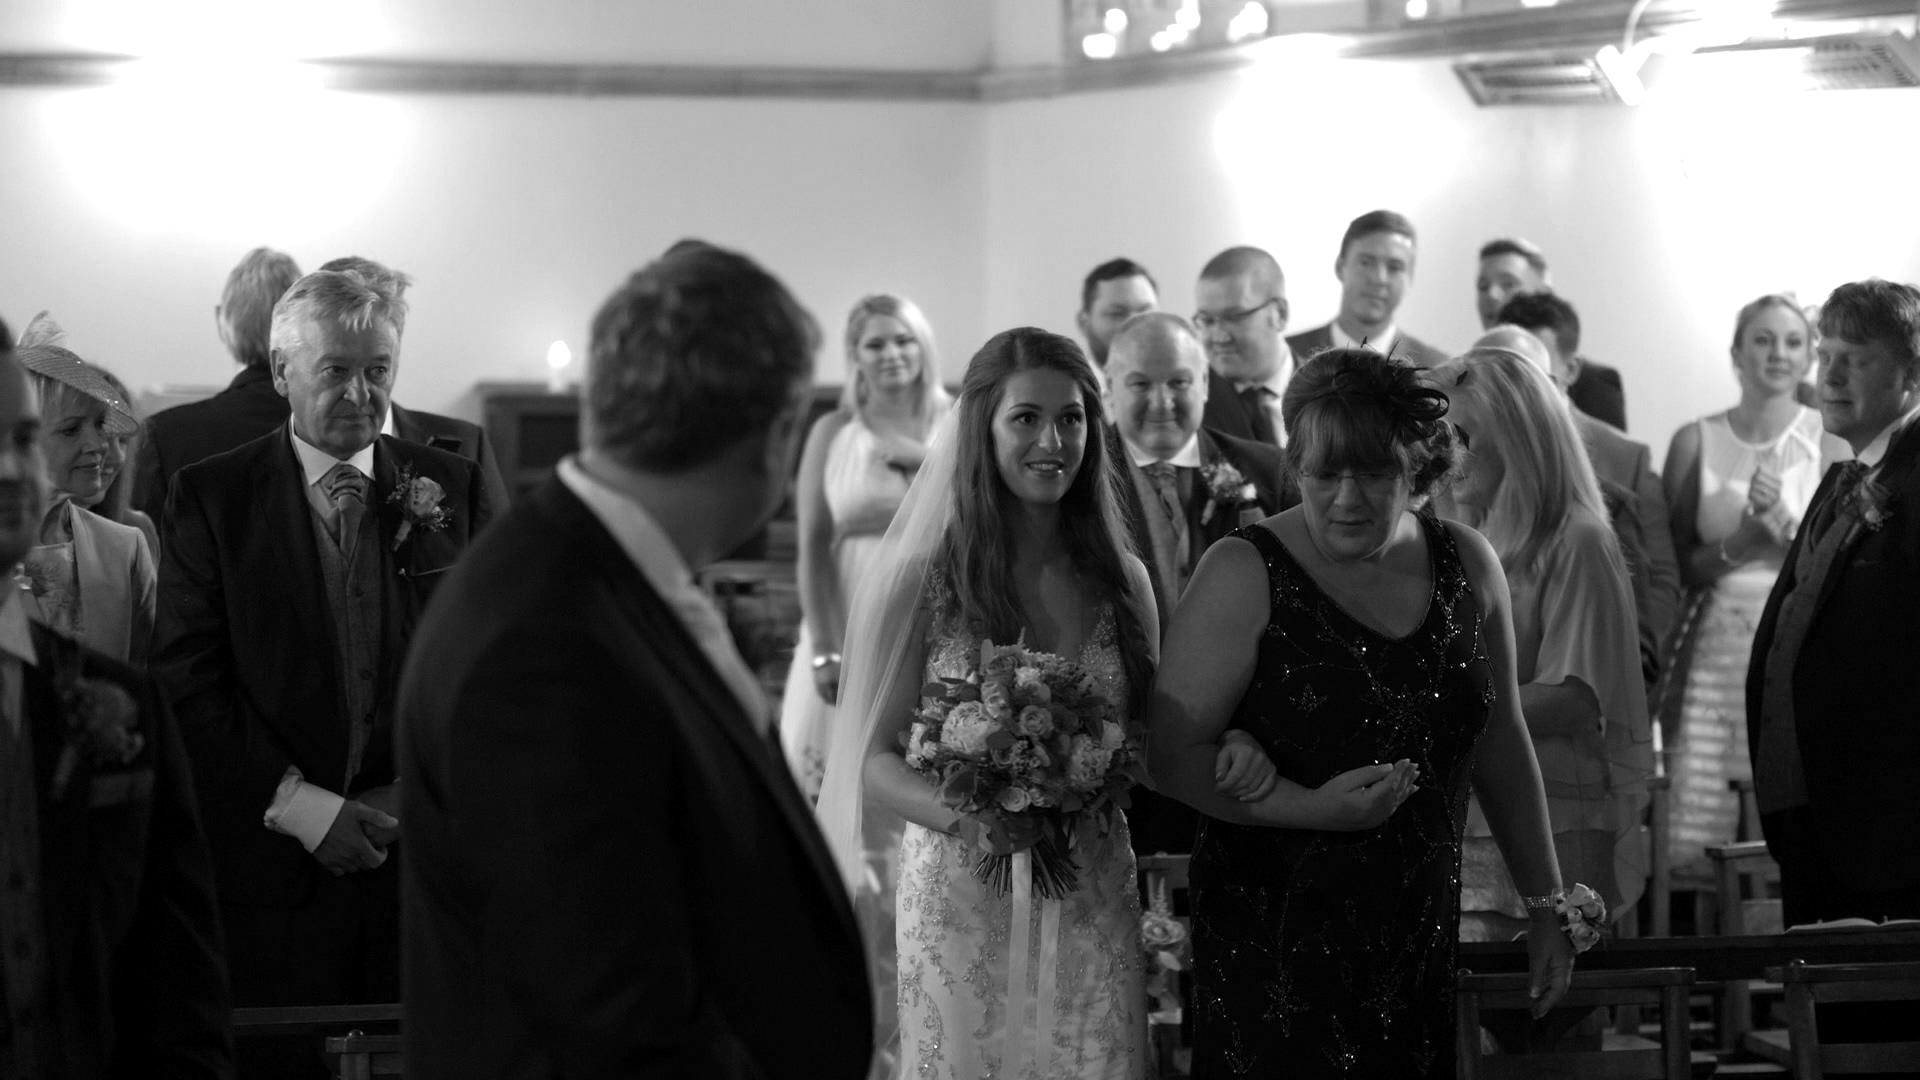 DRUMTOCHTY-SUMMER-WEDDING (10).jpg